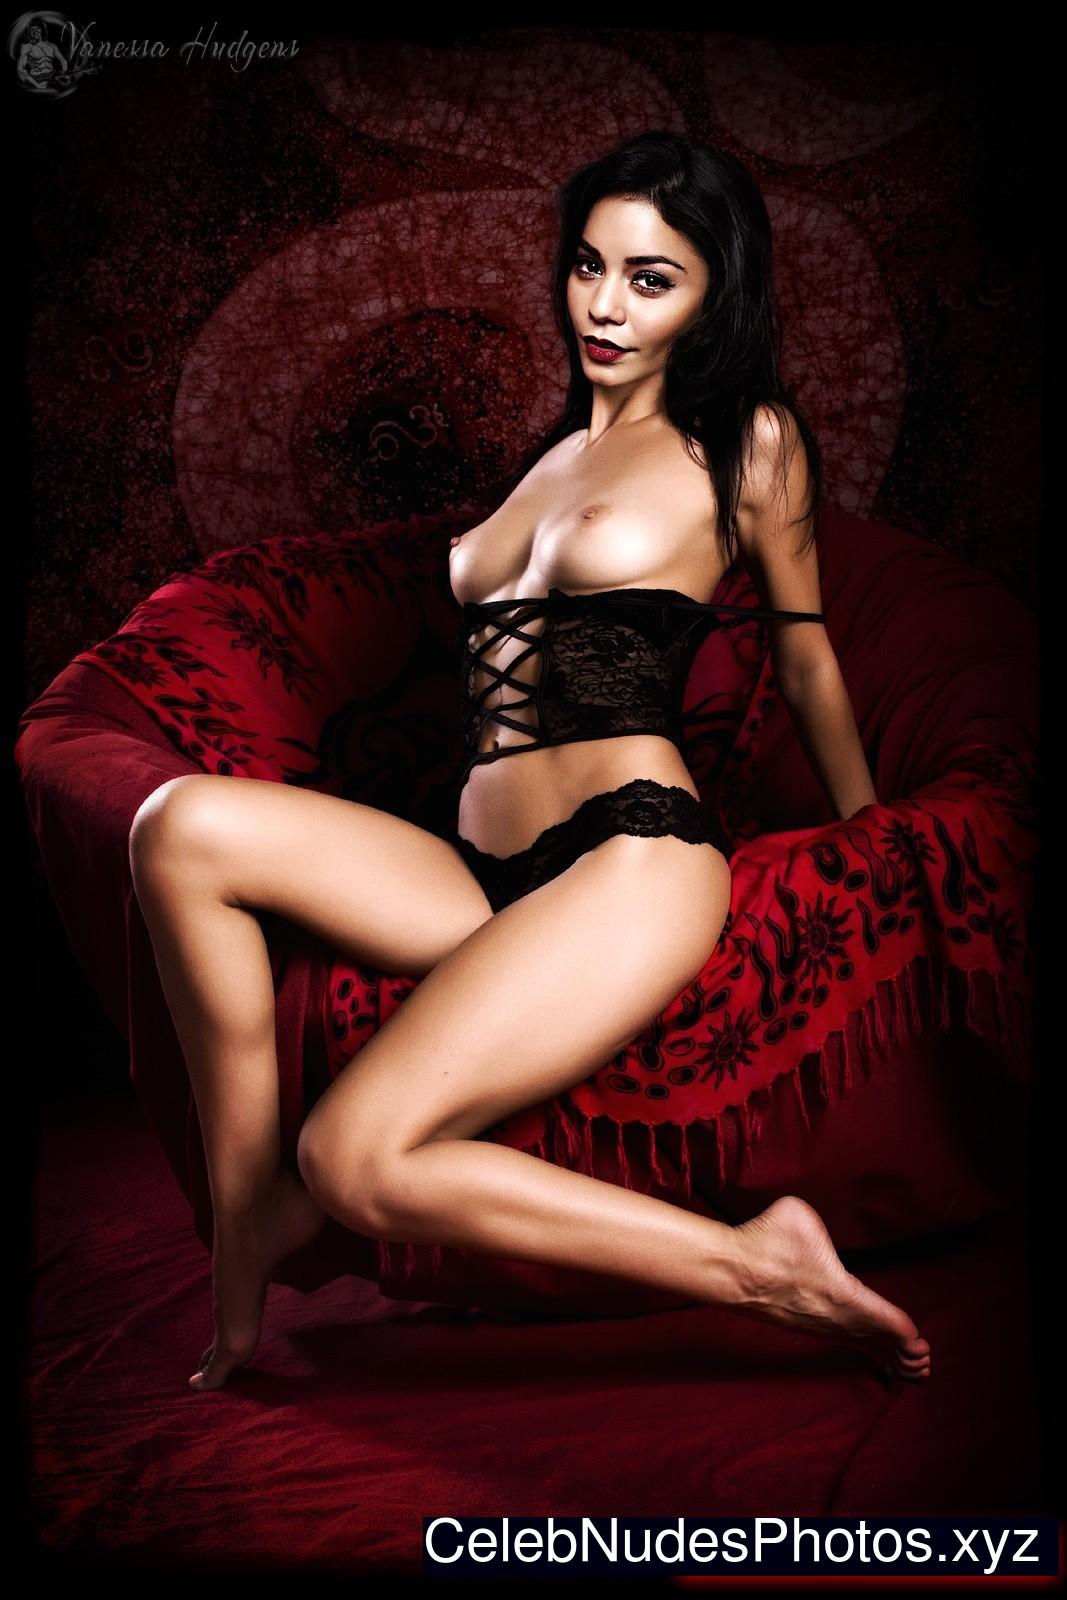 Vanessa Hudgens Celebrity Nude Pic sexy 10